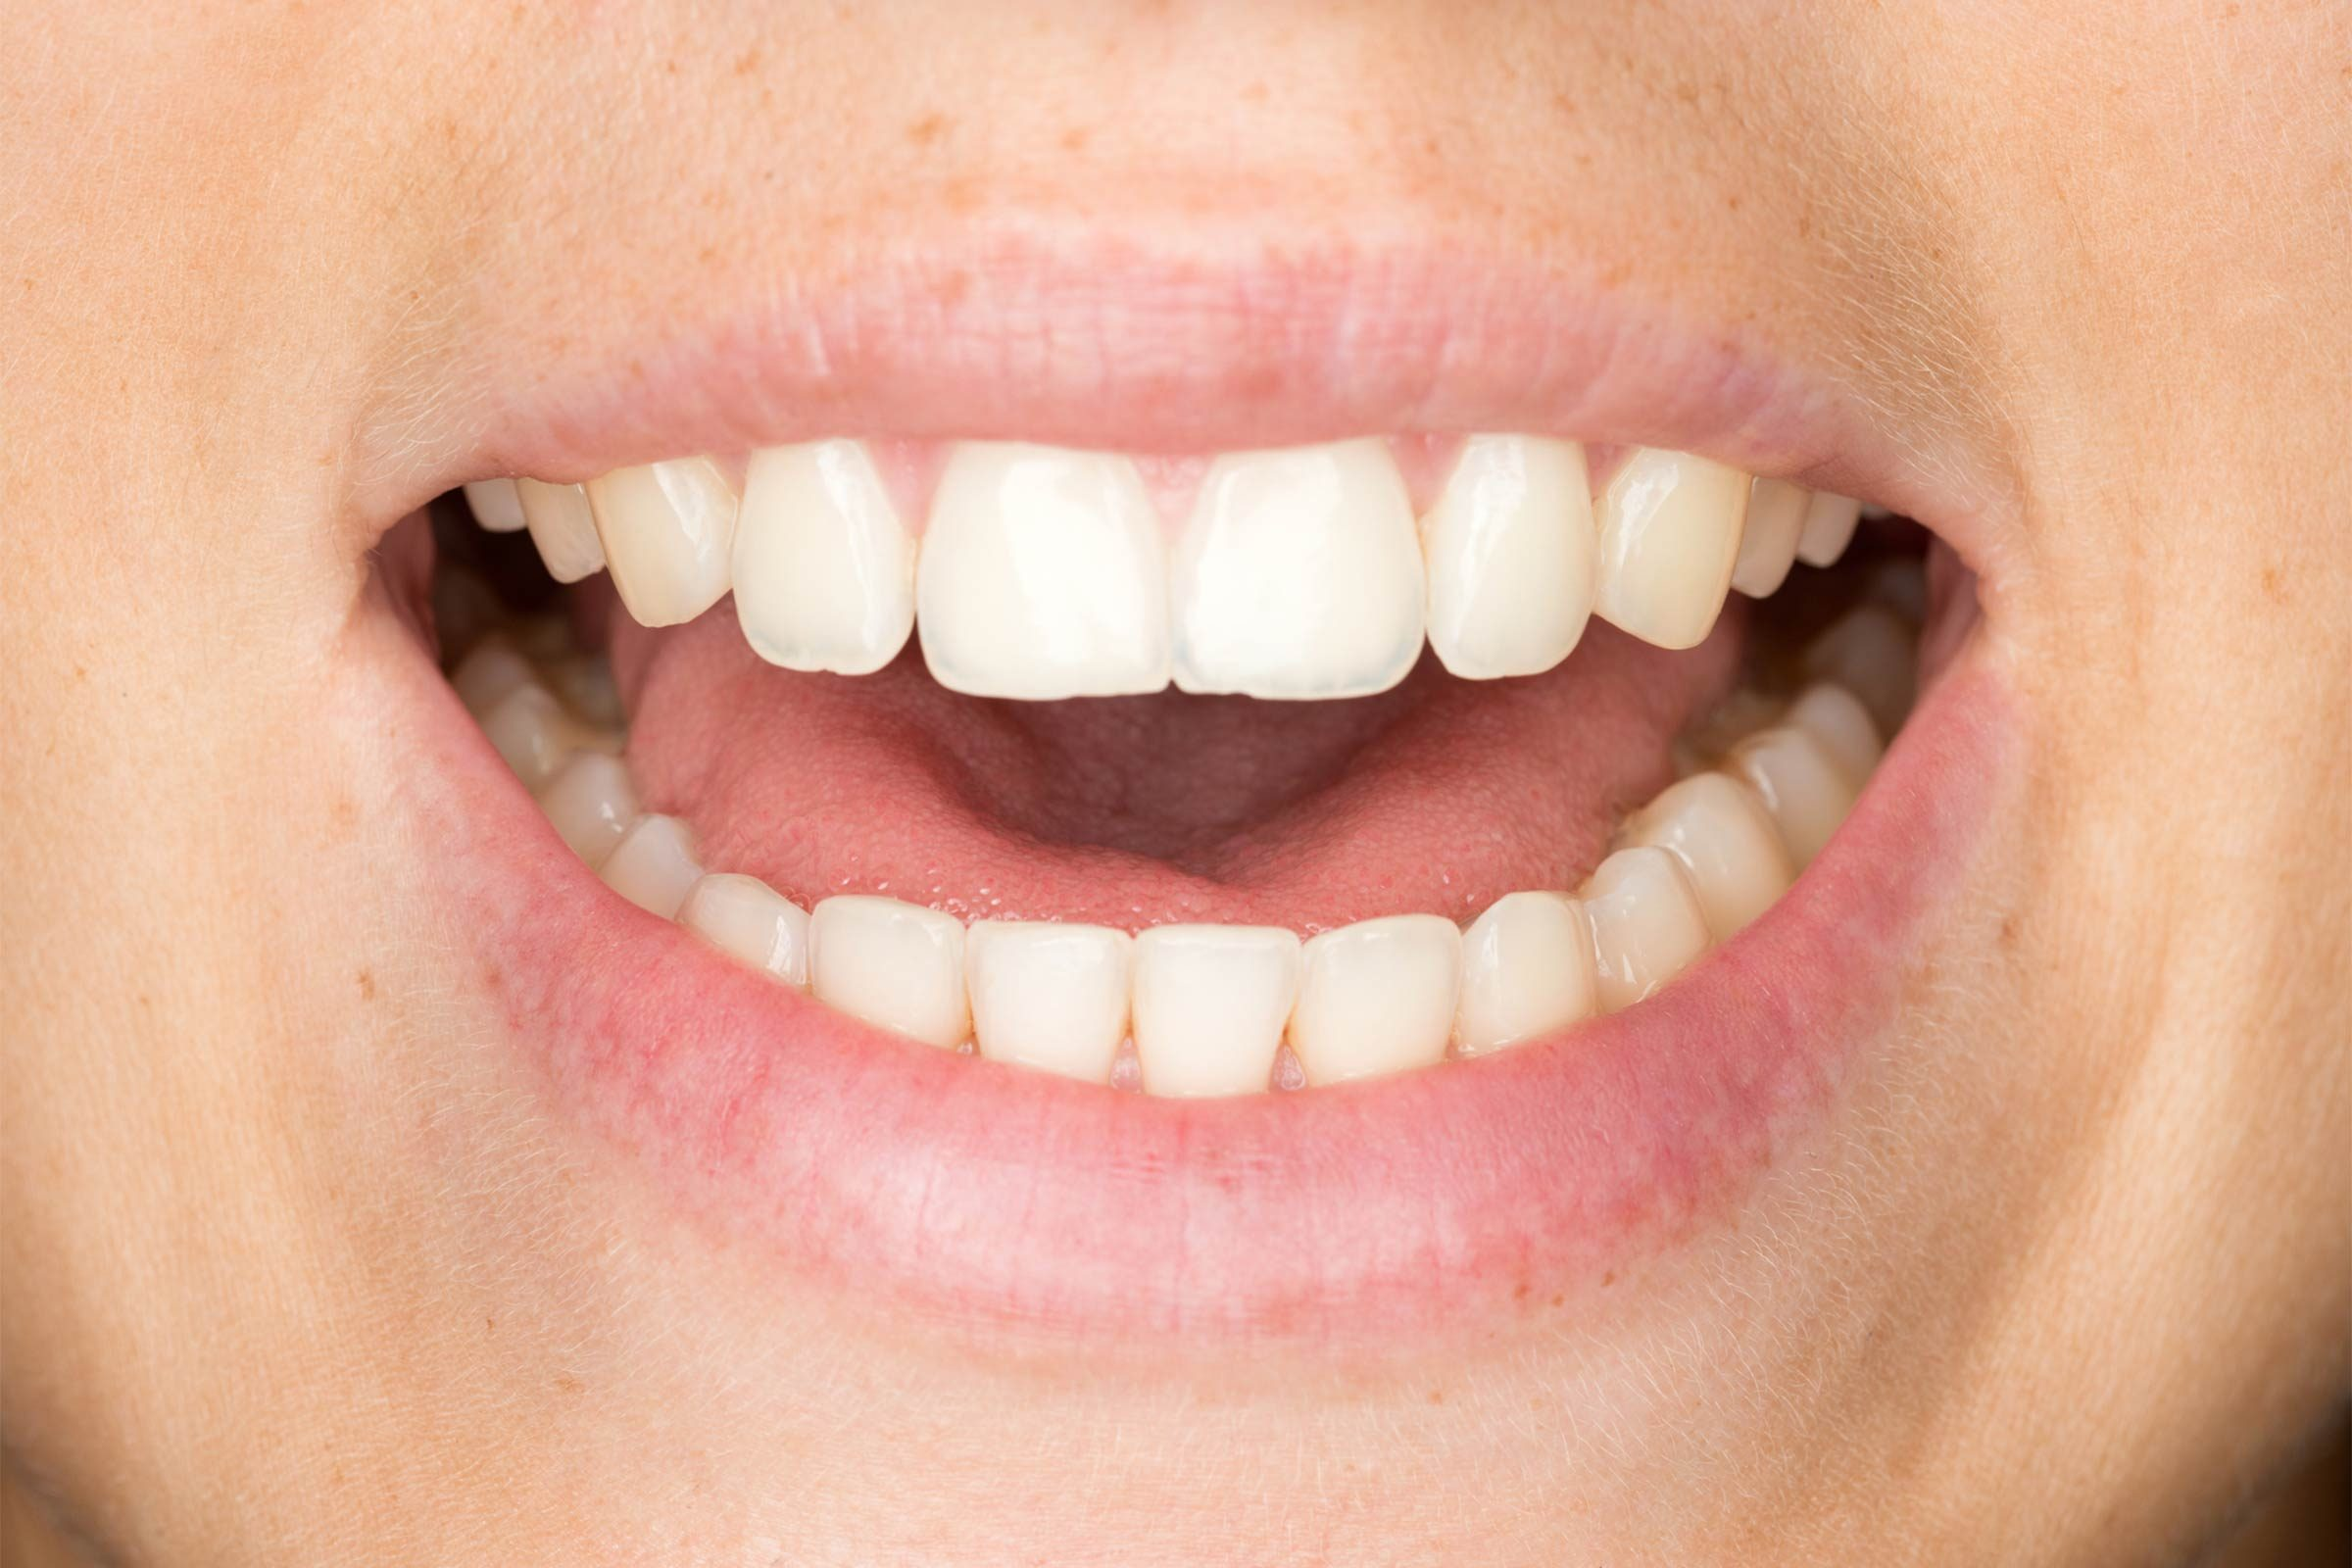 What is laryngitis